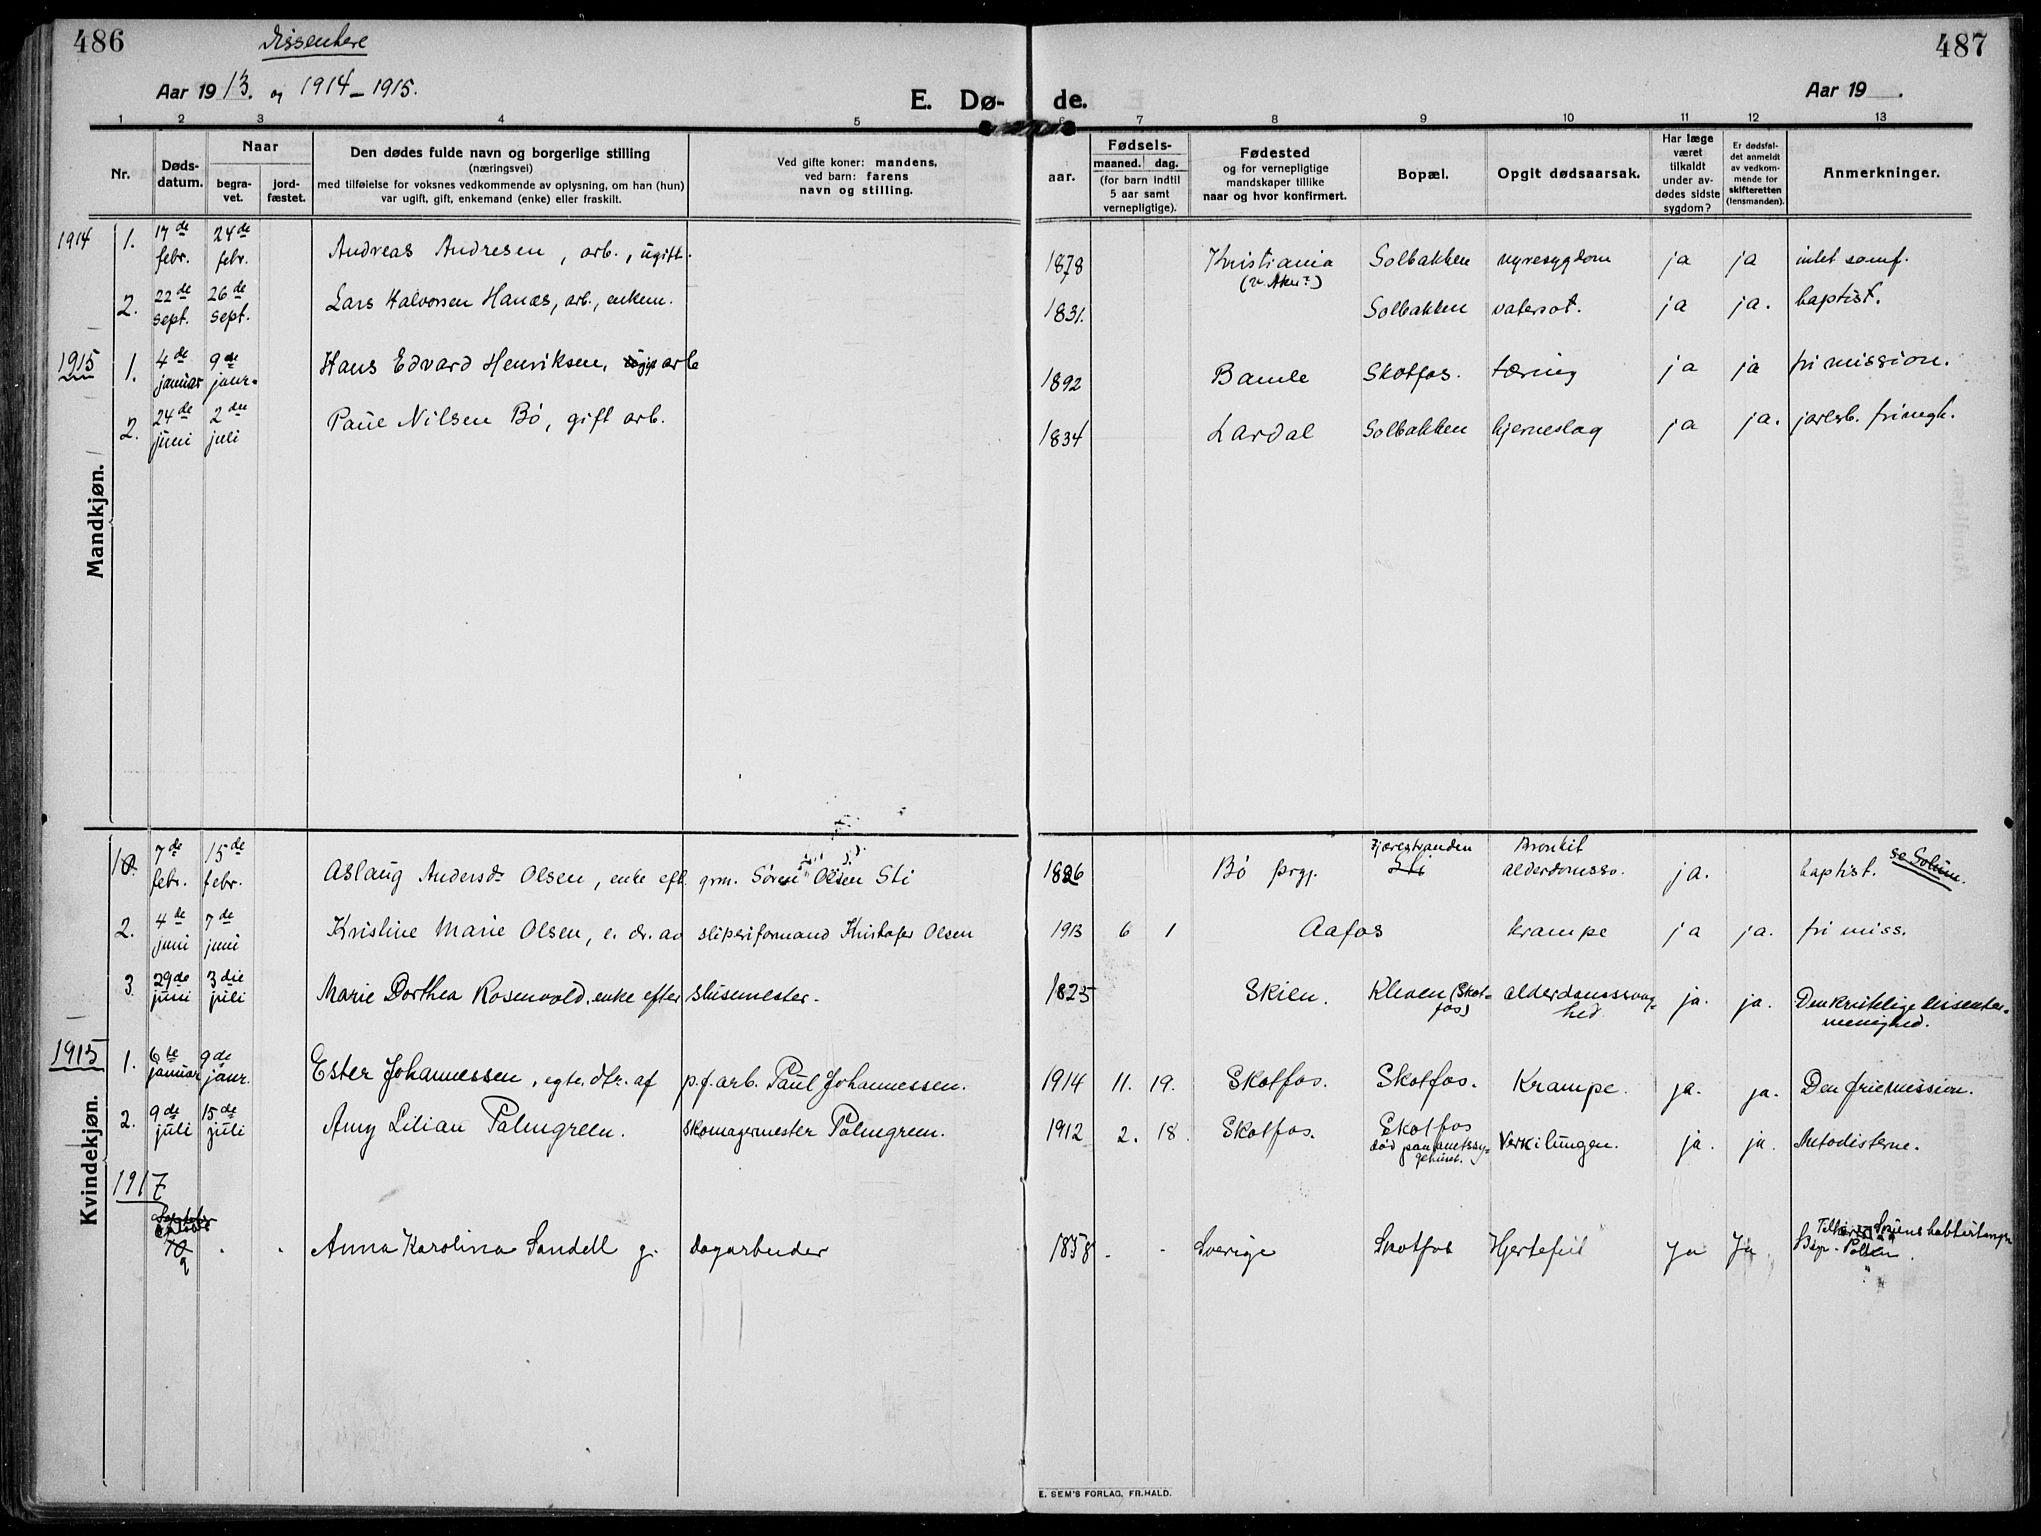 SAKO, Solum kirkebøker, F/Fb/L0004: Ministerialbok nr. II 4, 1913-1924, s. 486-487